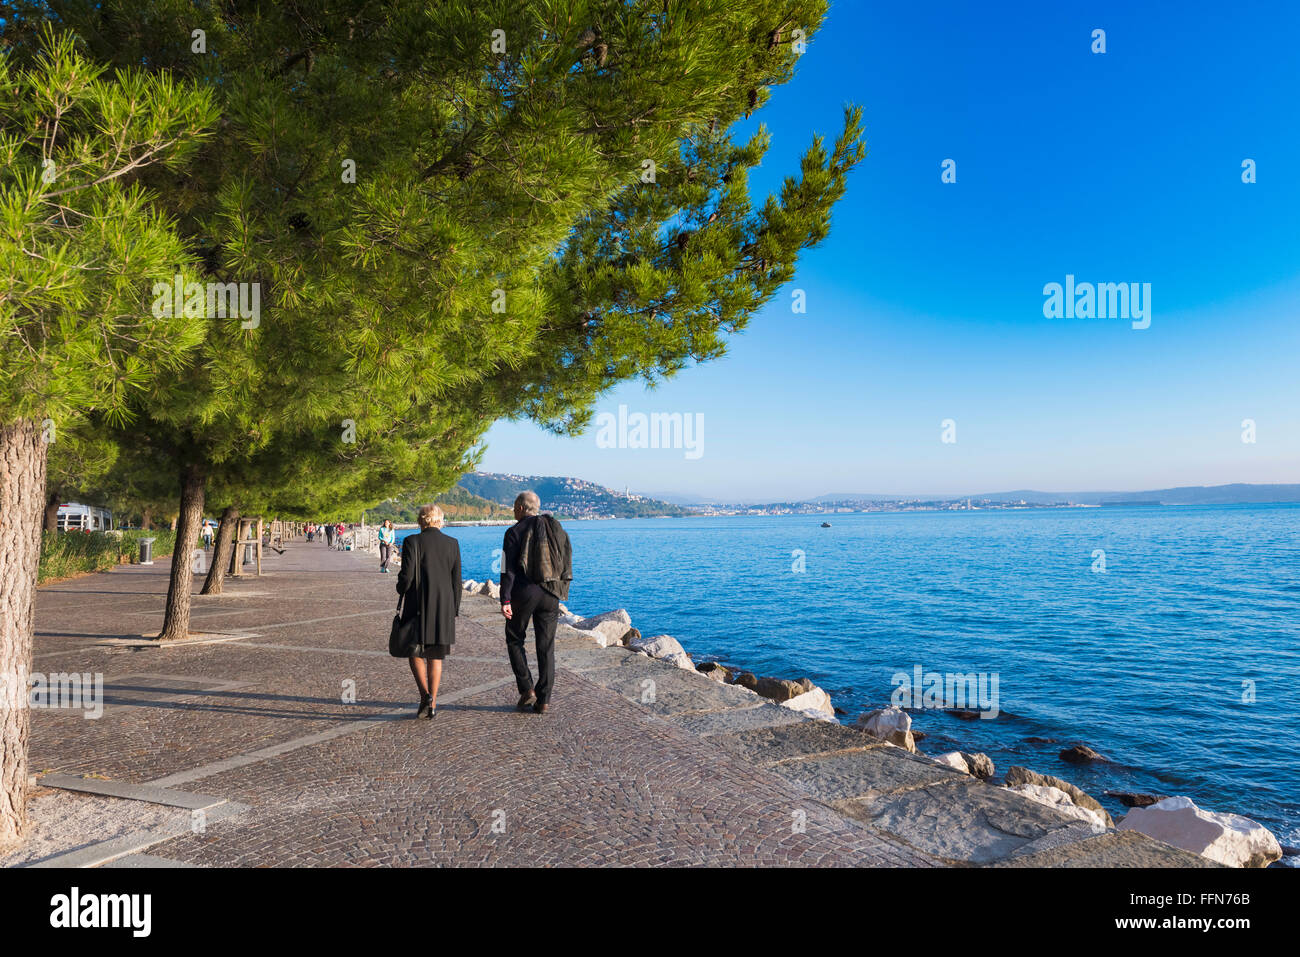 Couple walking along the Promenade along the Adriatic Sea coast at Trieste, Italy, Europe - Stock Image